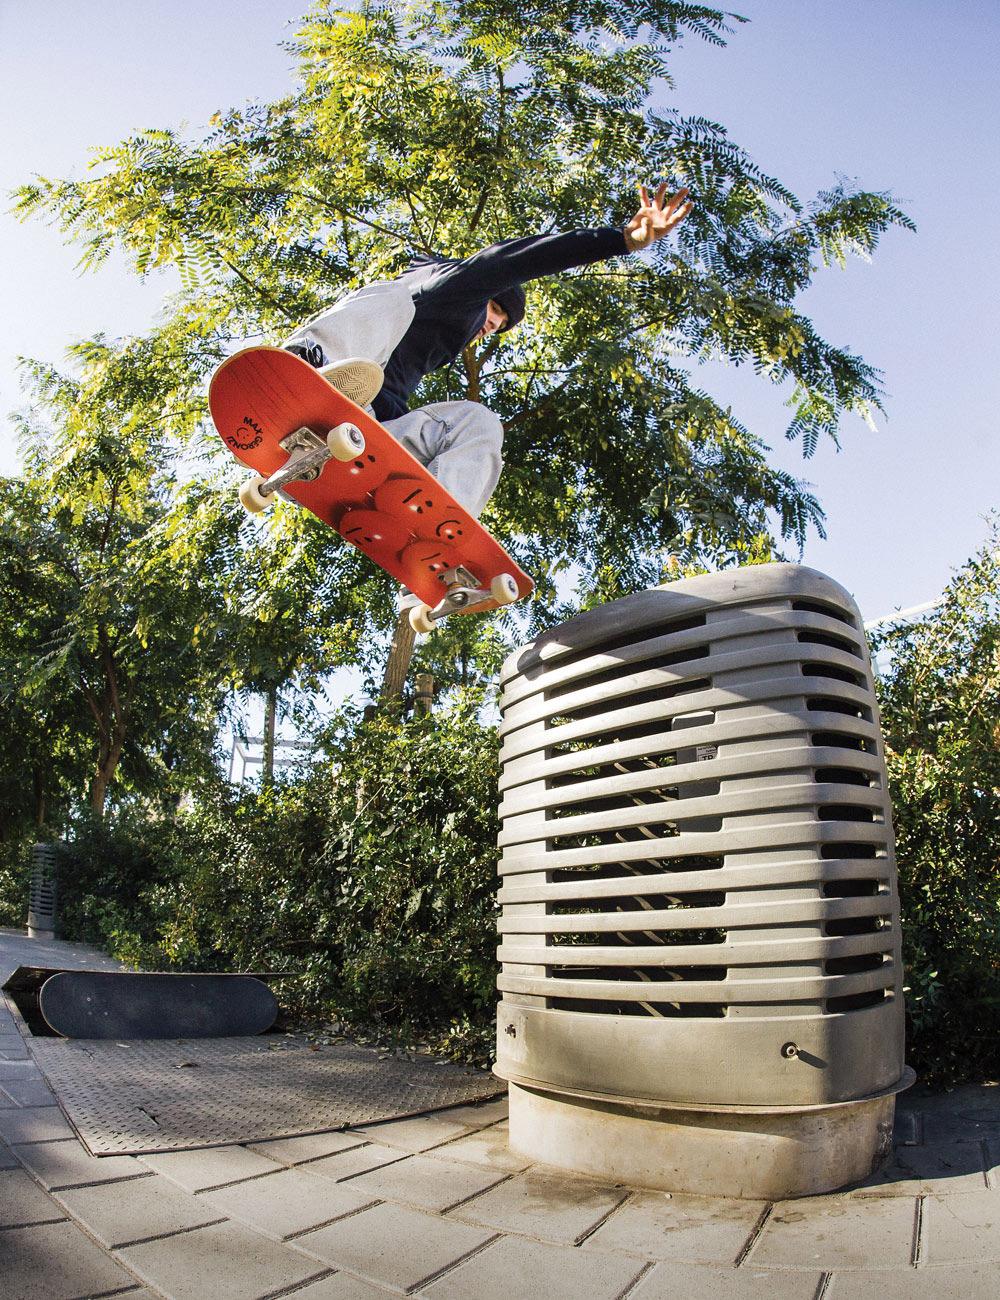 Max_Geronzi_swtailslide_rogerferrero_Almost-_SKateboards_Welcome_New_Pro.jpg